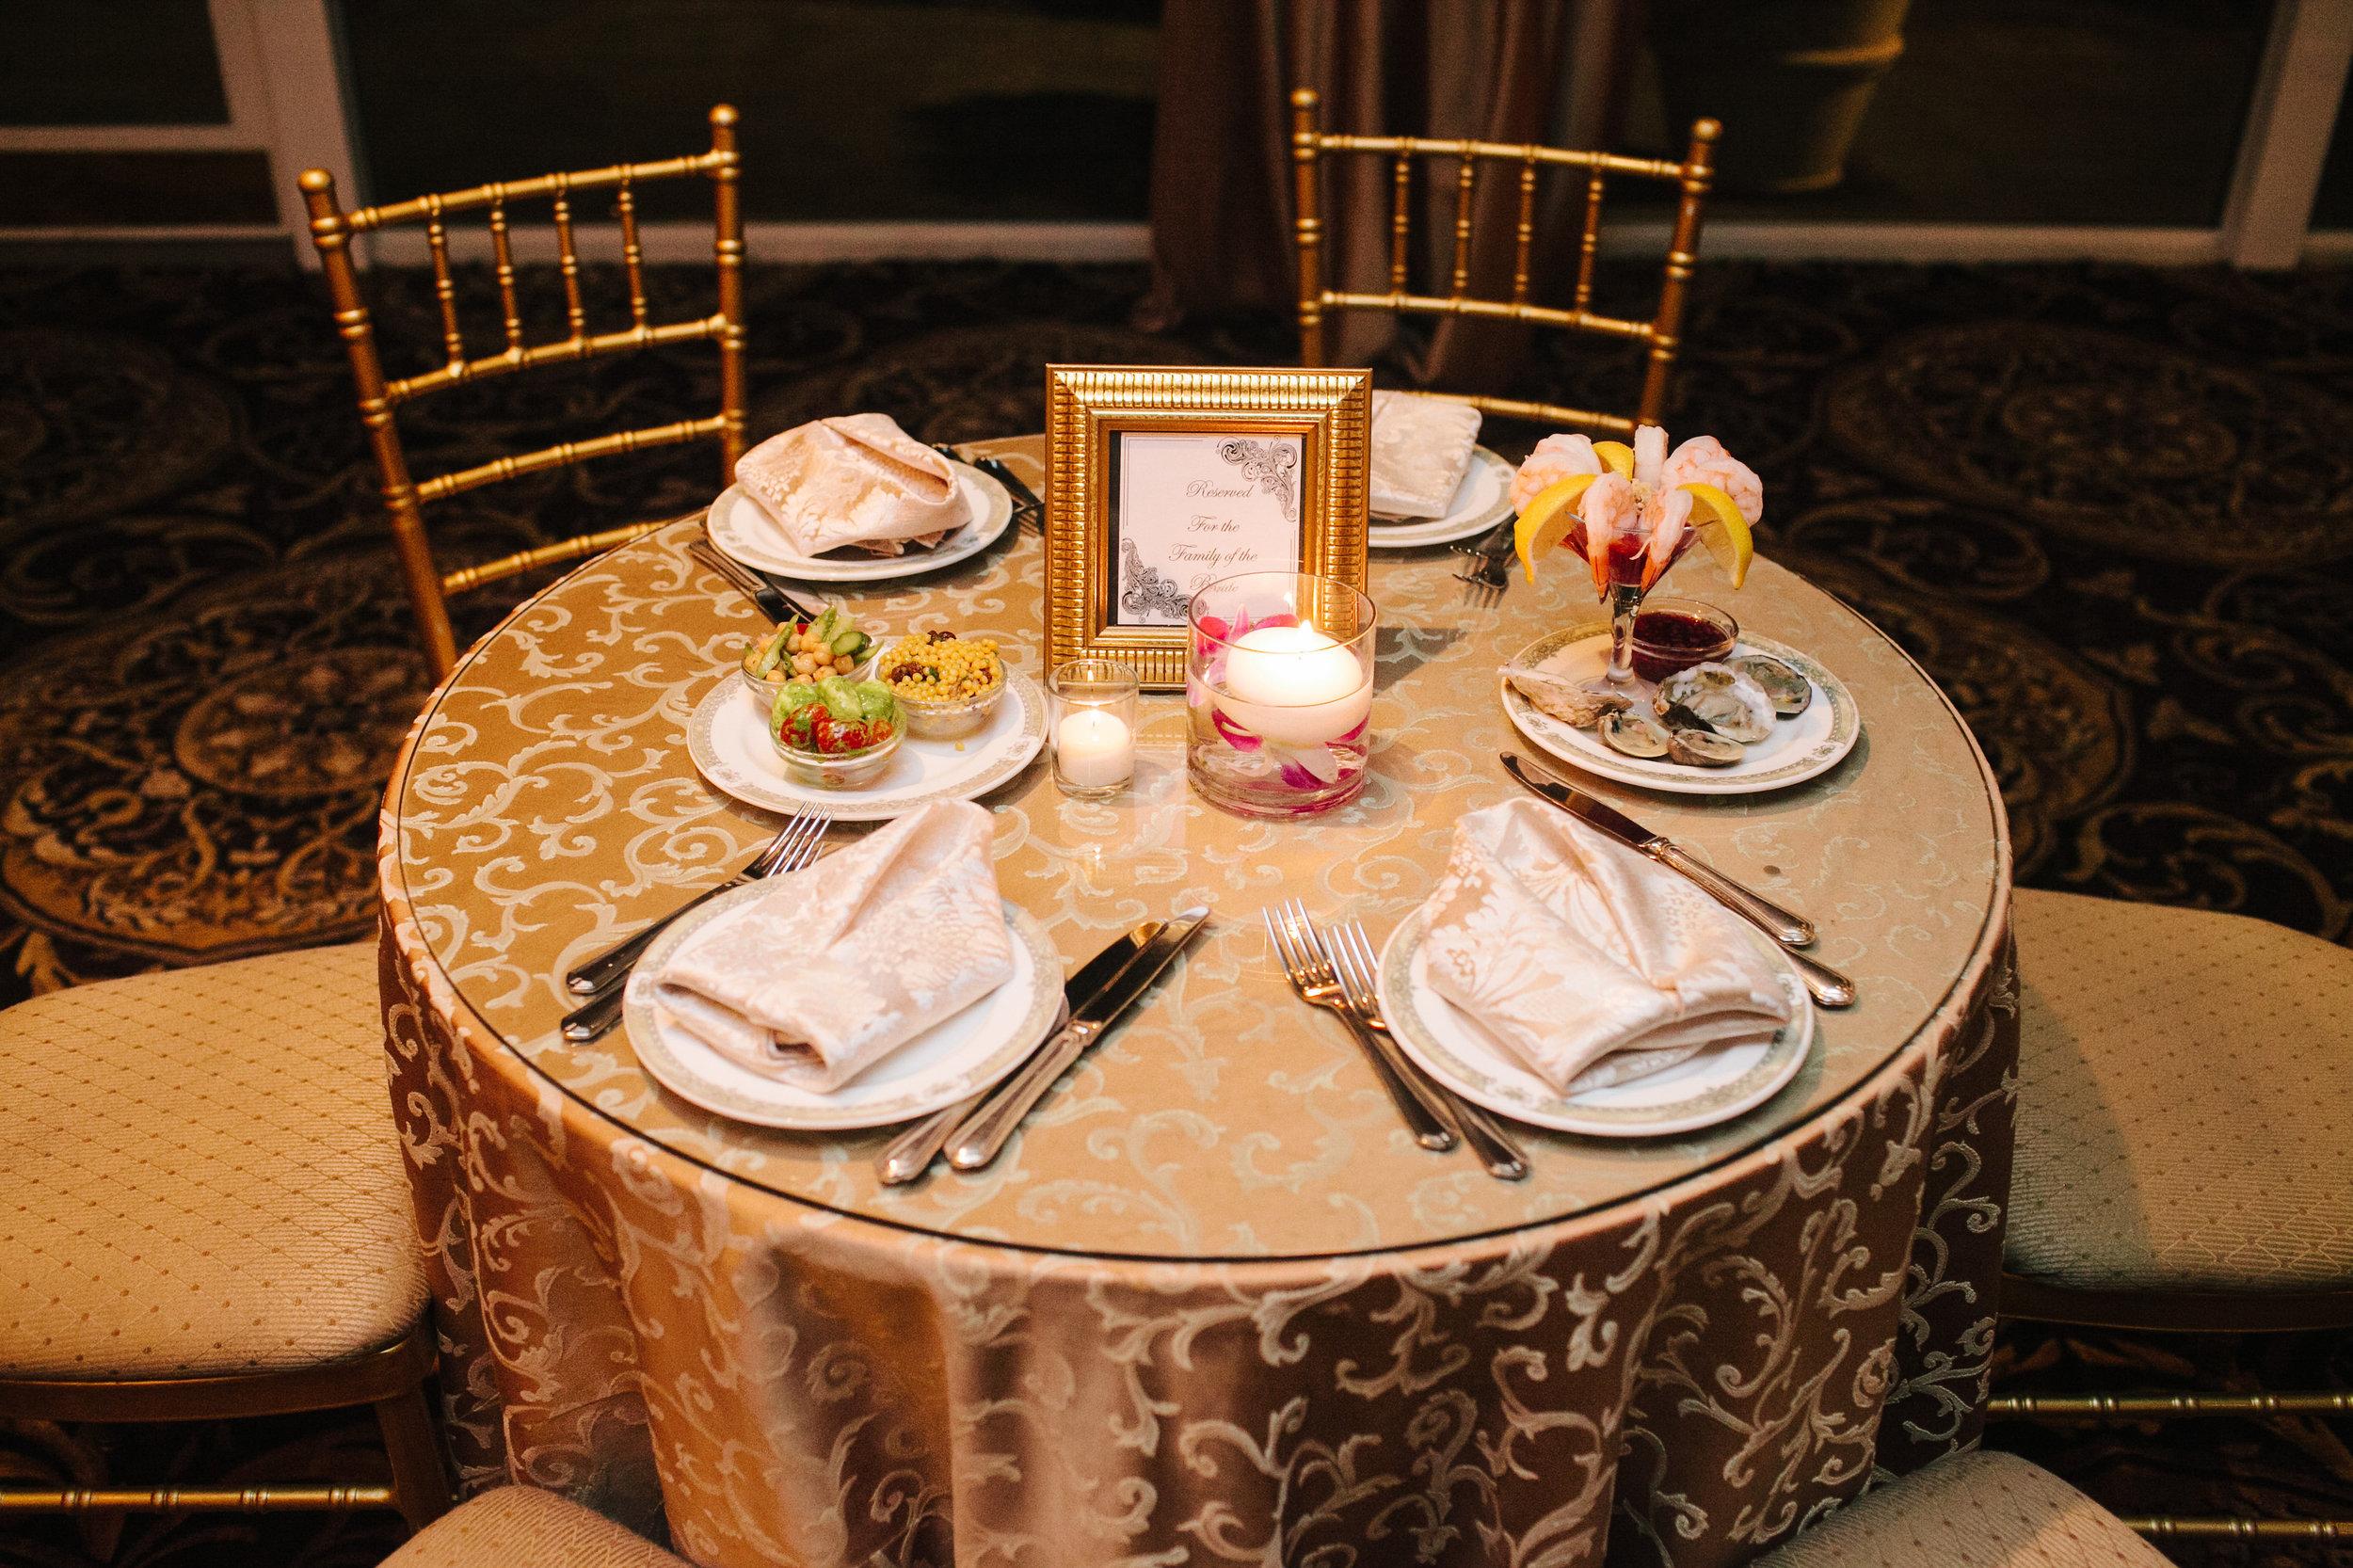 Ceci_New_York_Custom_Invitation_ New_Jersey_Wedding_Luxury_Personalized_Ceci_Style_Bride_Foil_Stamping157.JPG